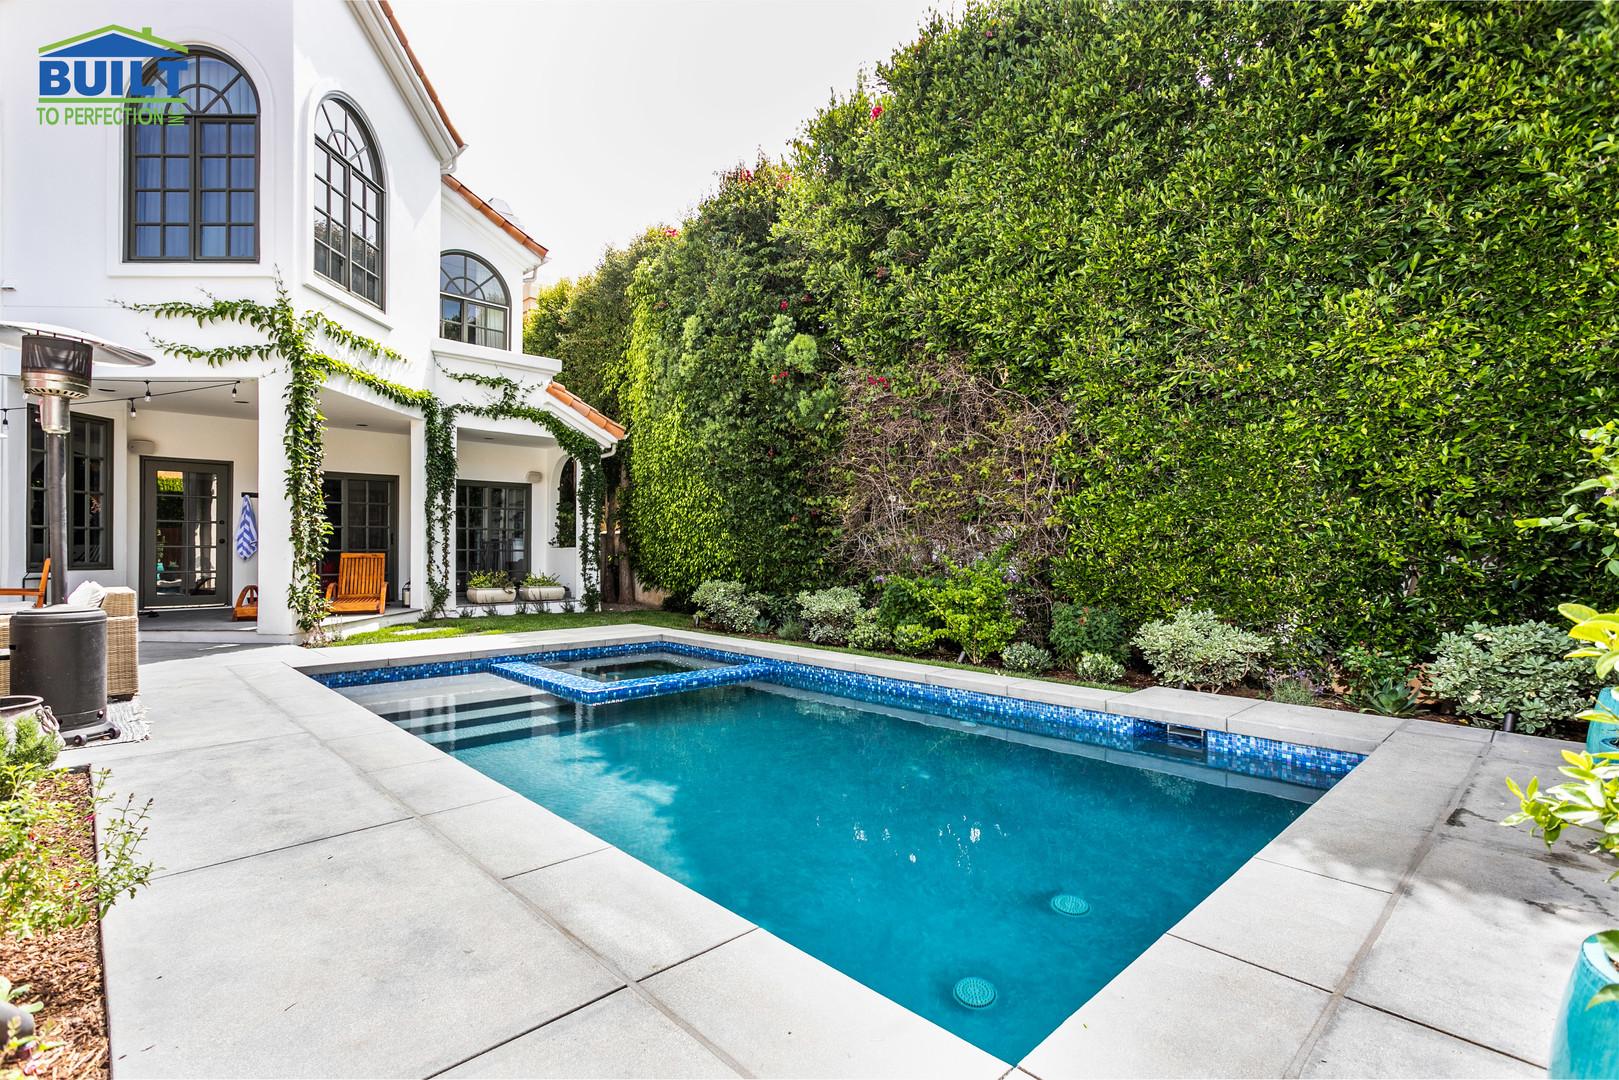 Pool & Backyard Remodel